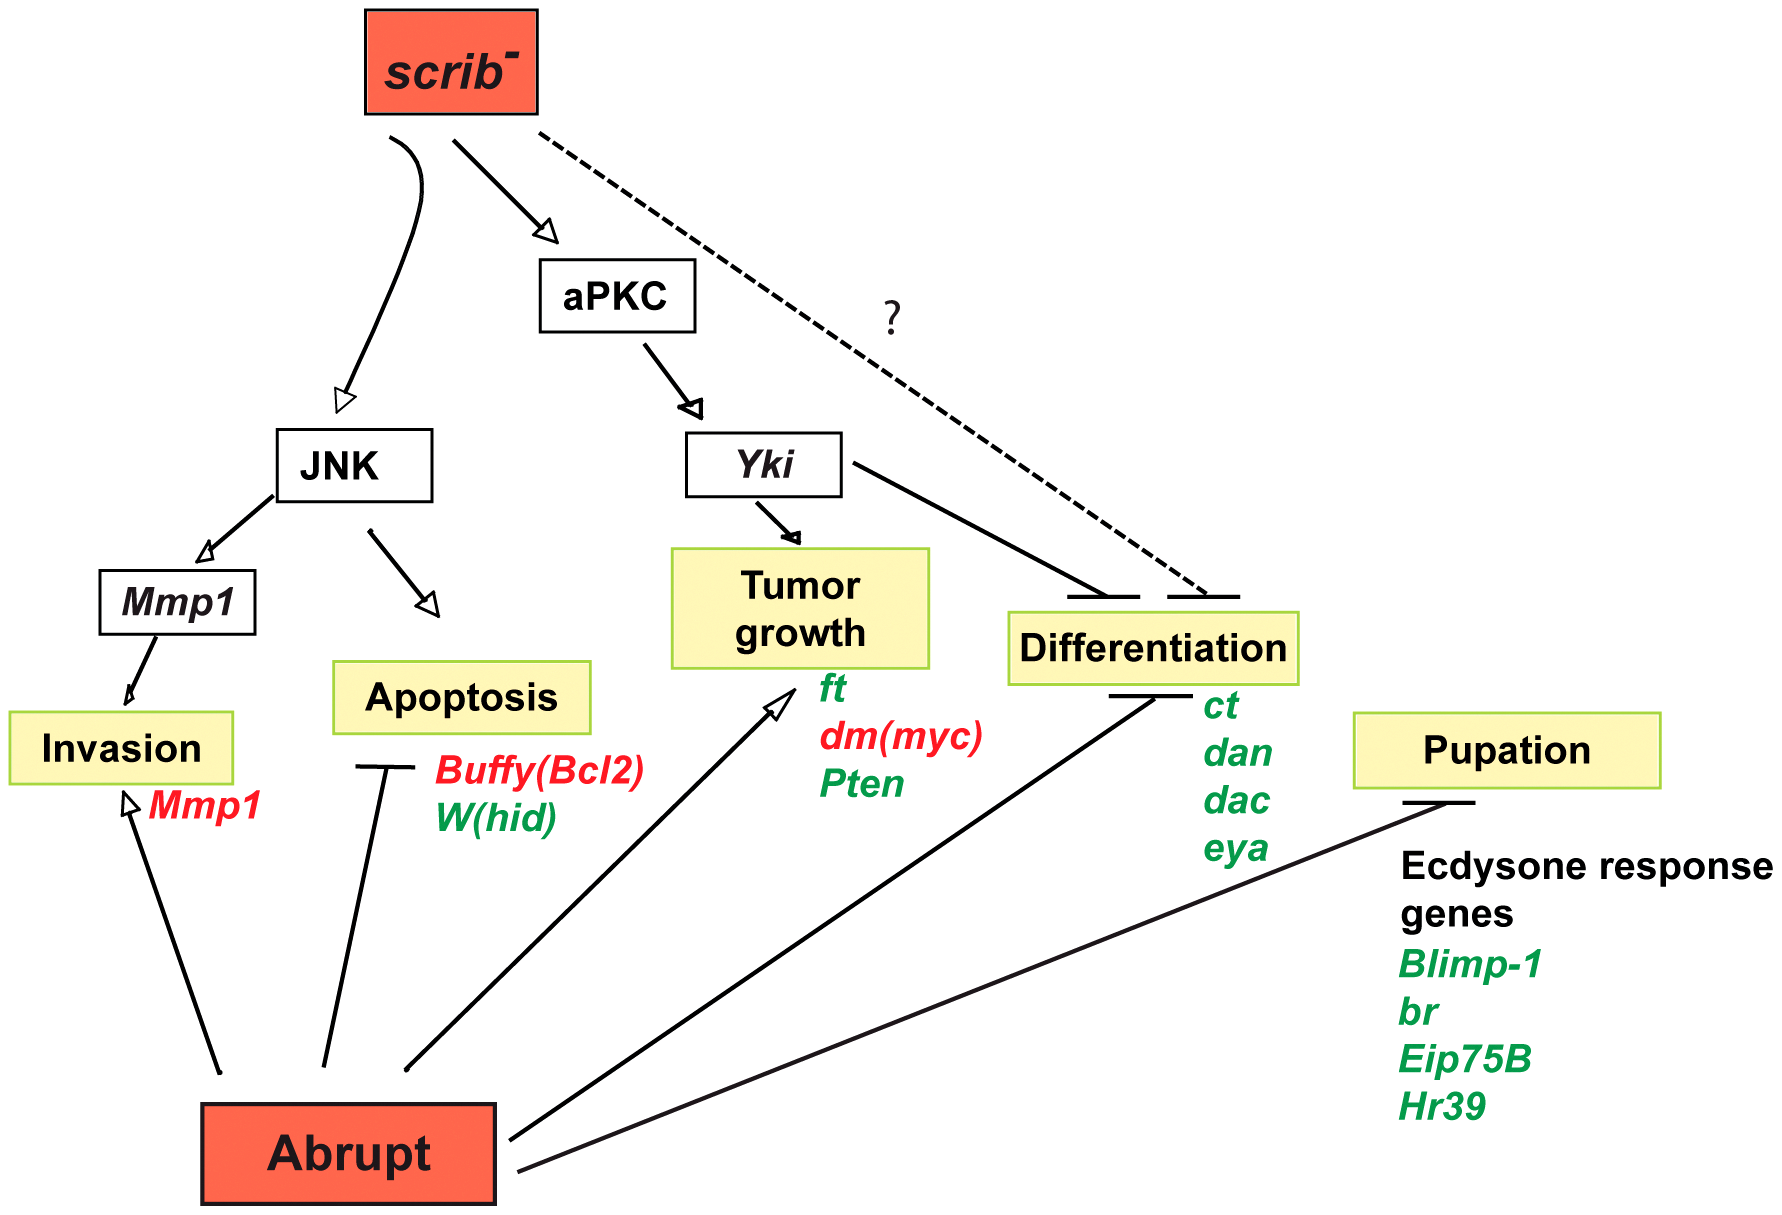 Model illustrating the pathways involved in <i>scrib</i><sup>−</sup>+<i>ab</i> cooperative tumour overgrowth.